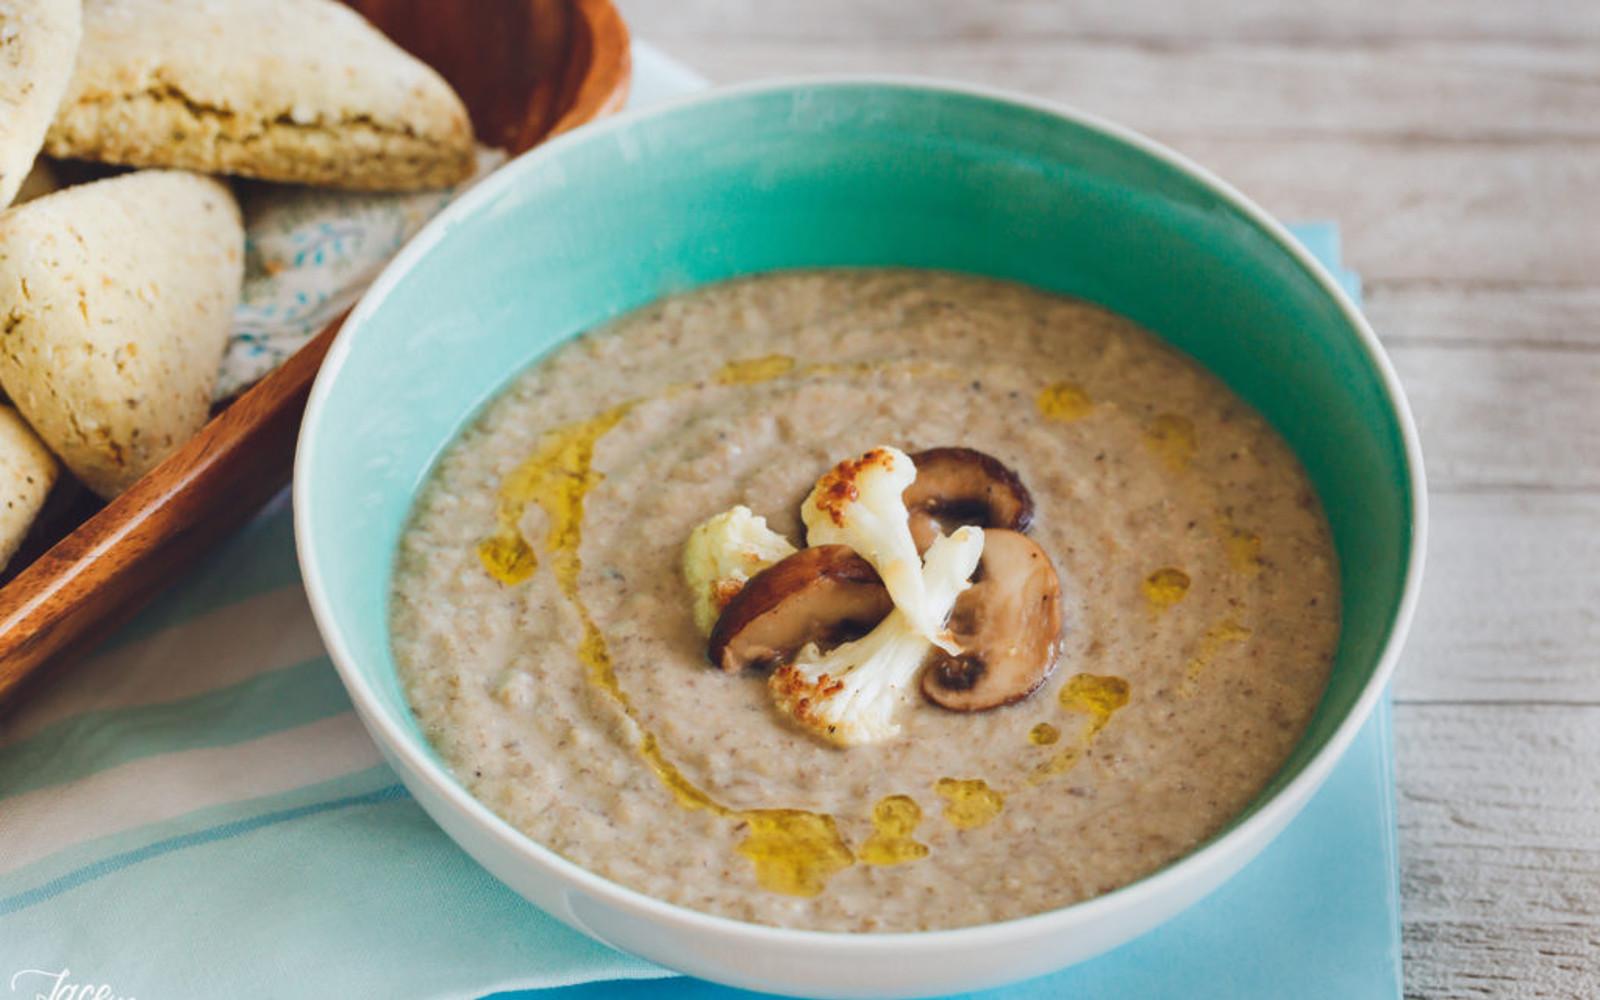 Oven Roasted Mushroom and Cauliflower Soup